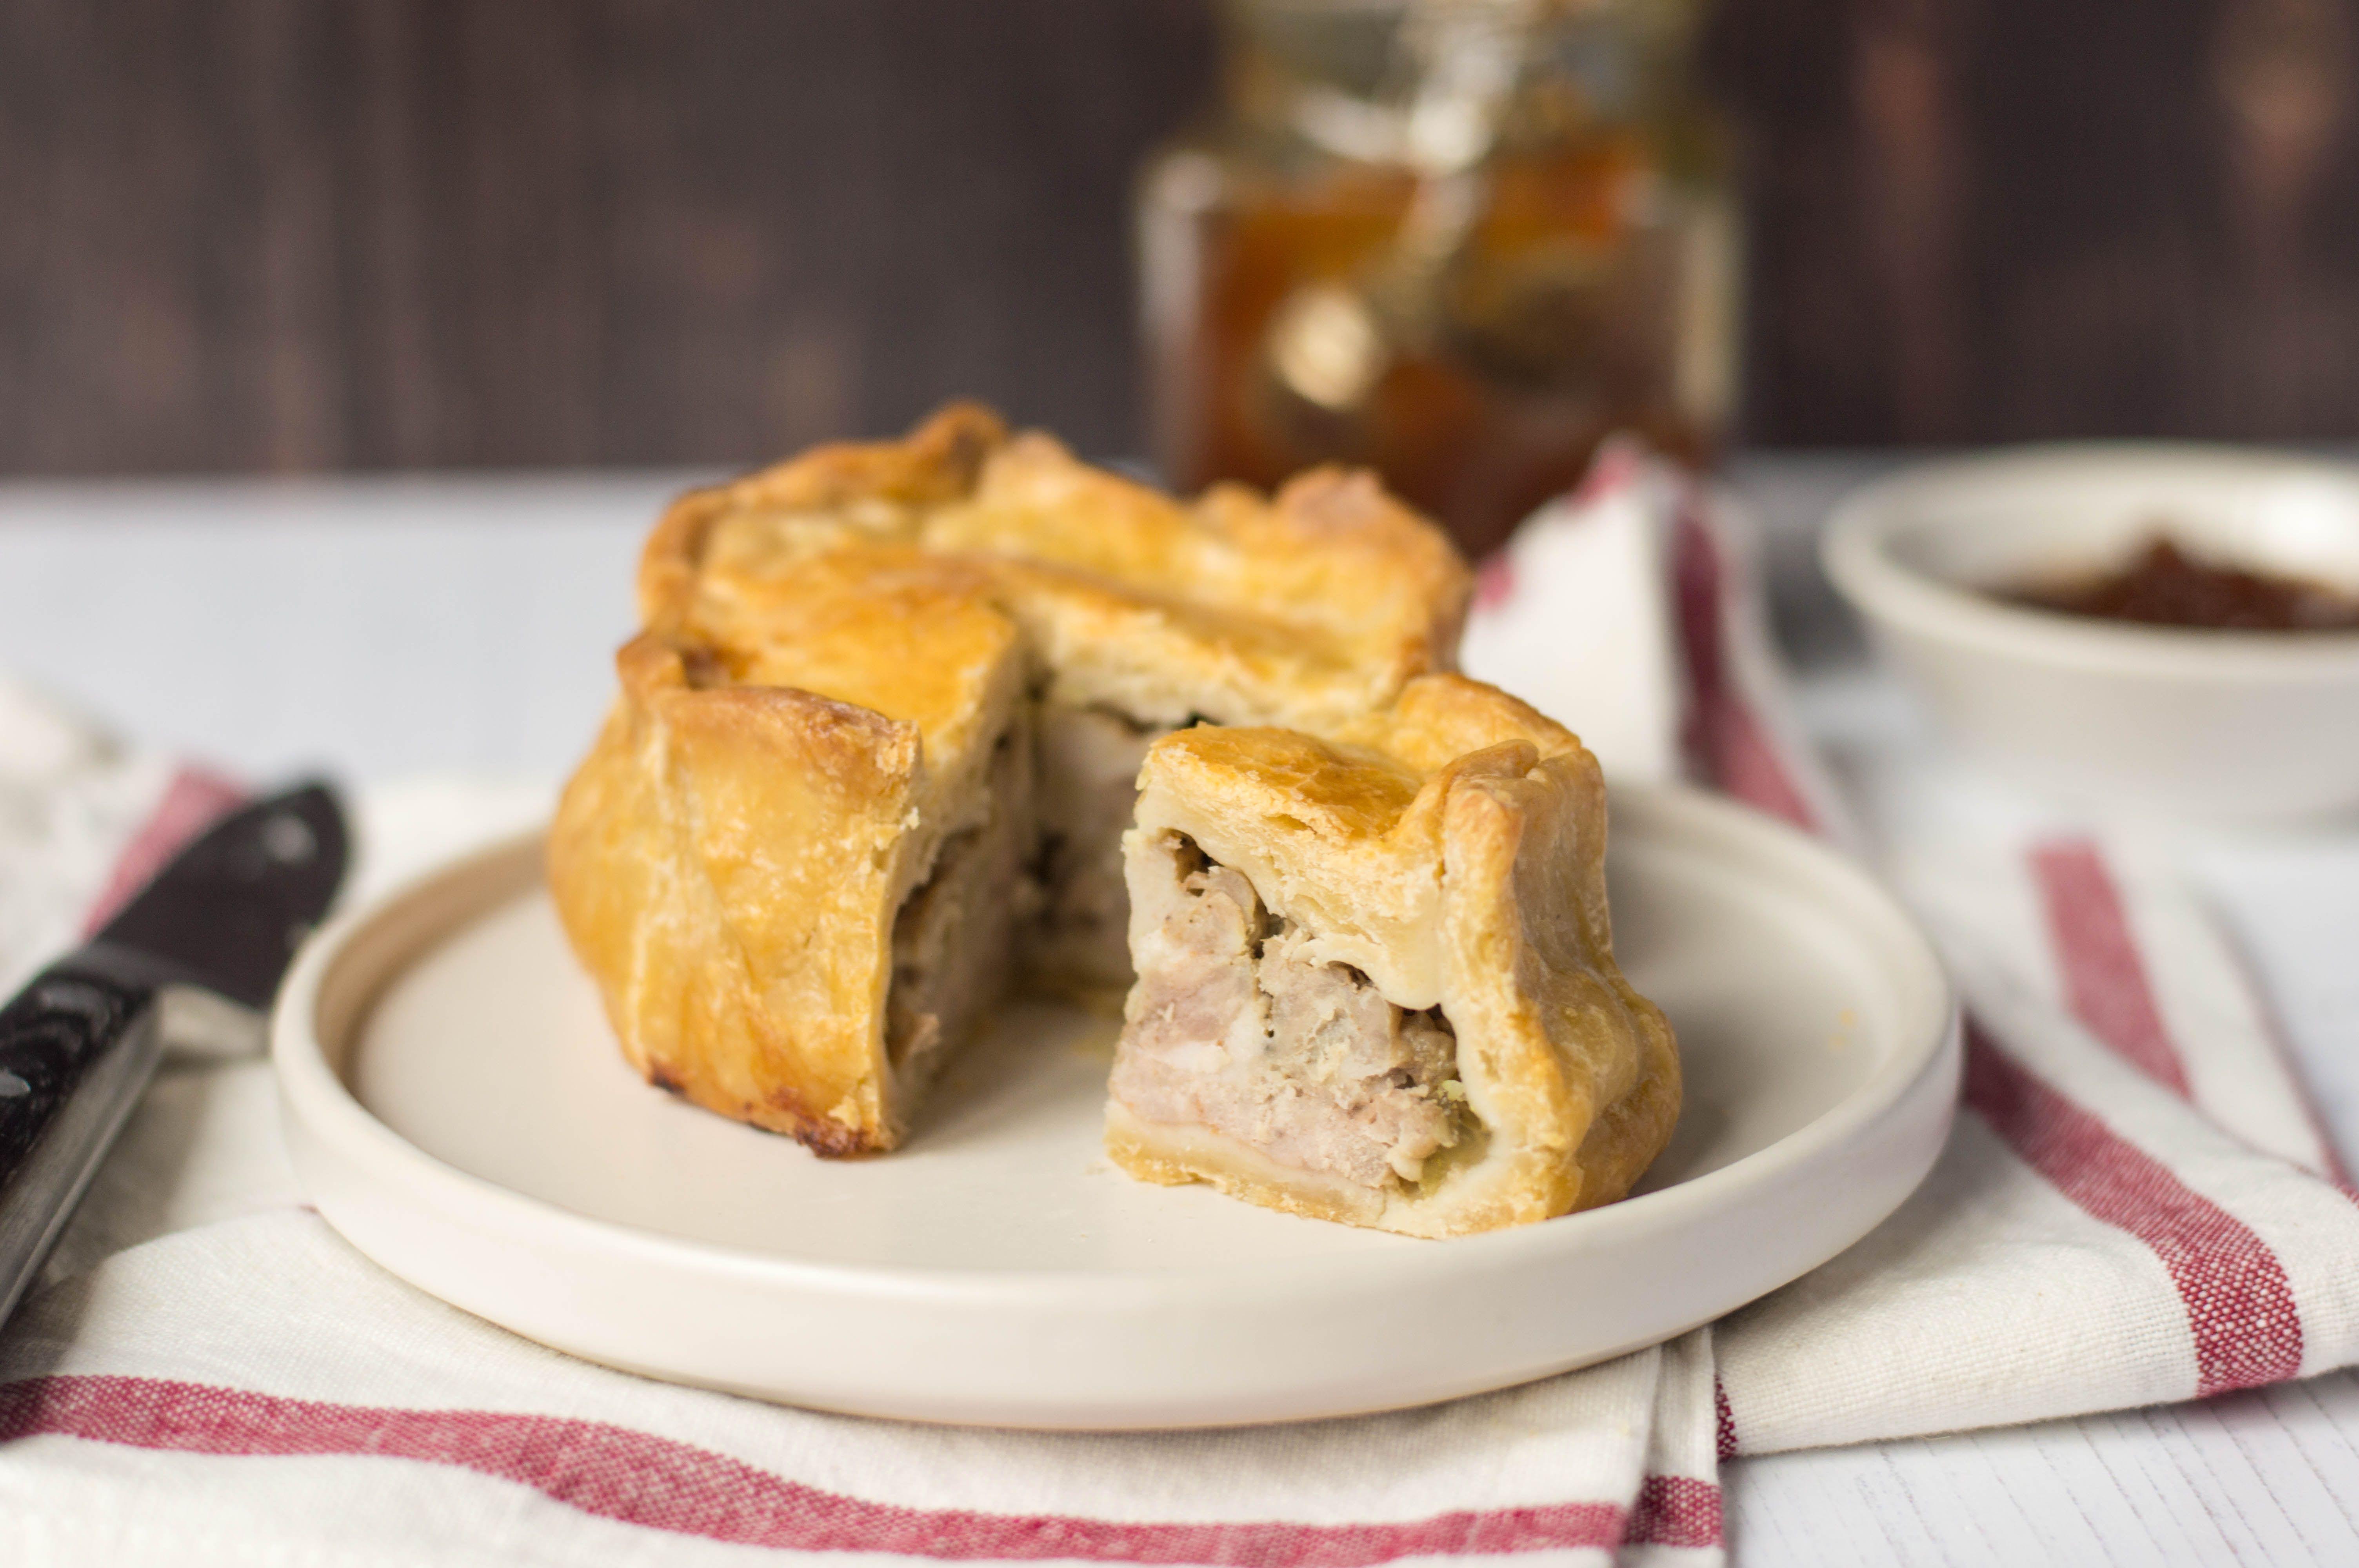 Hand-raised pork pie